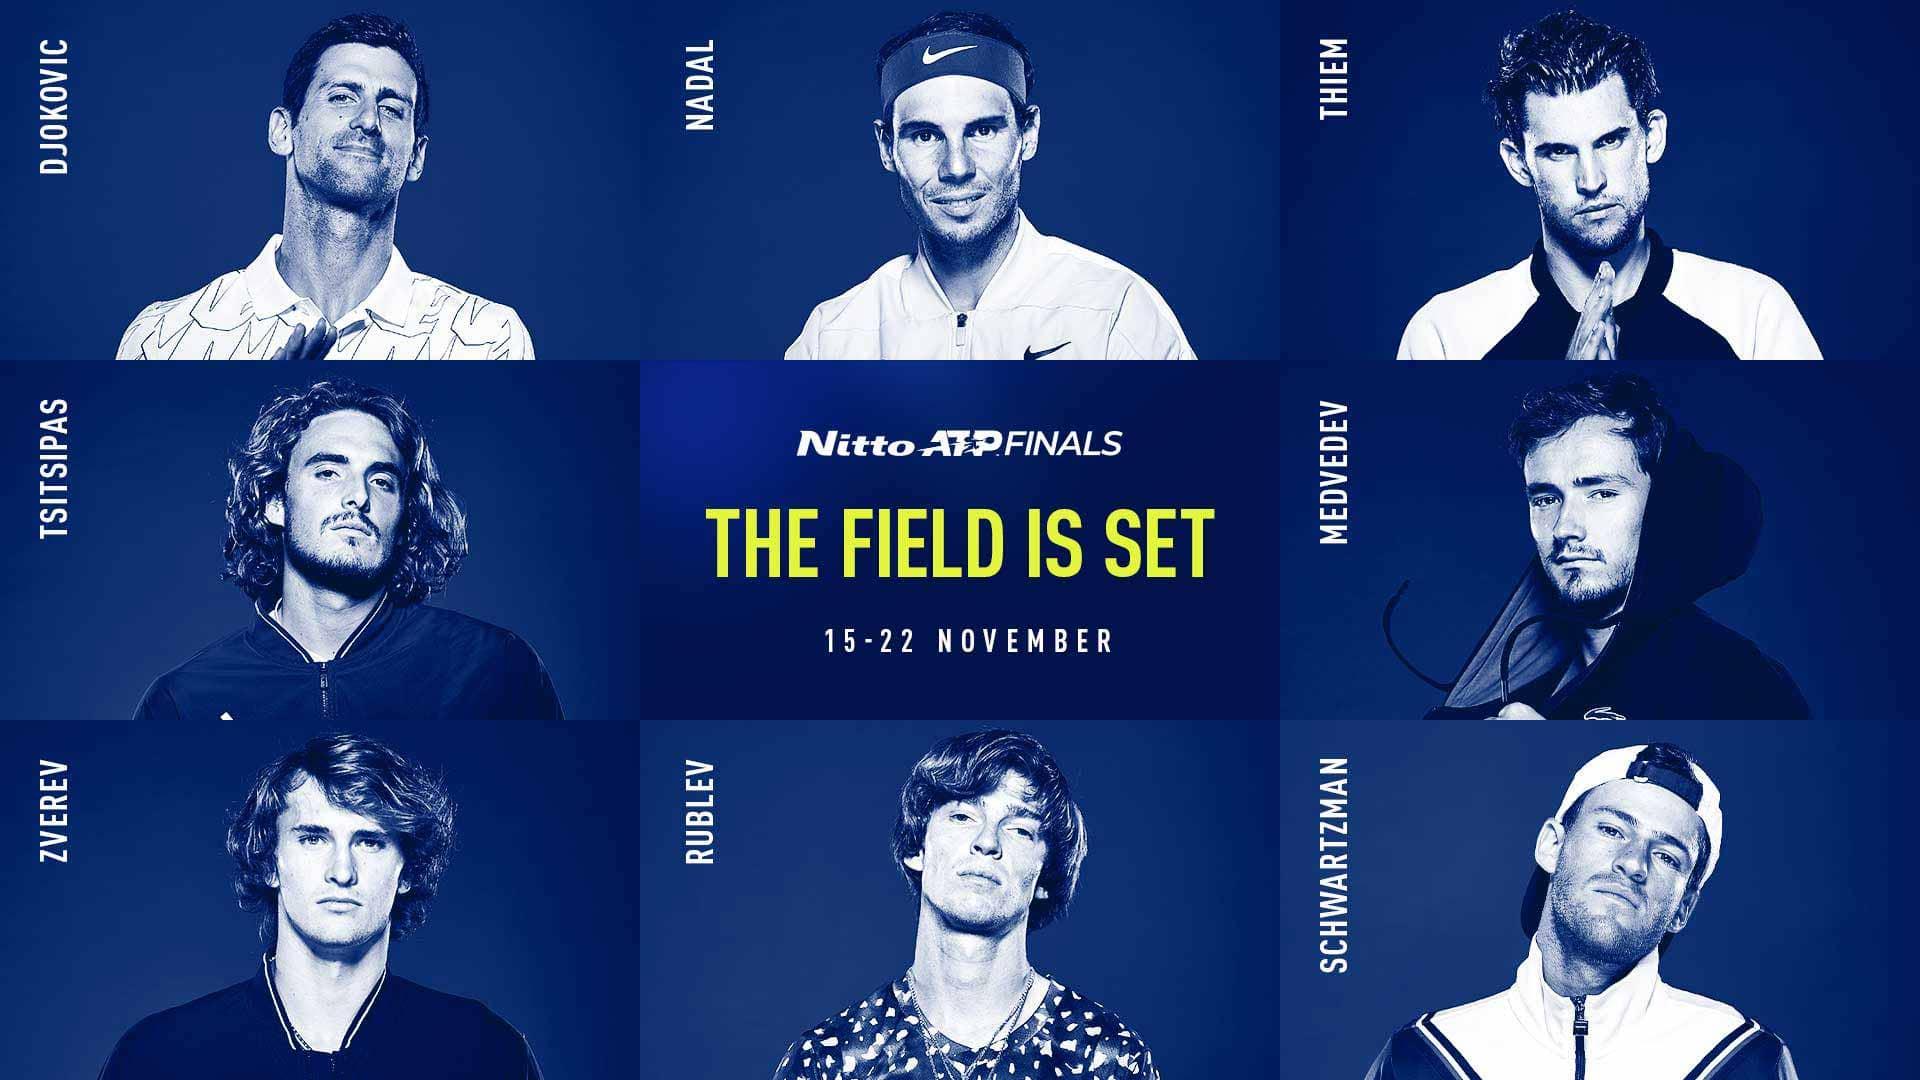 2020-nitto-atp-finals-field-is-set